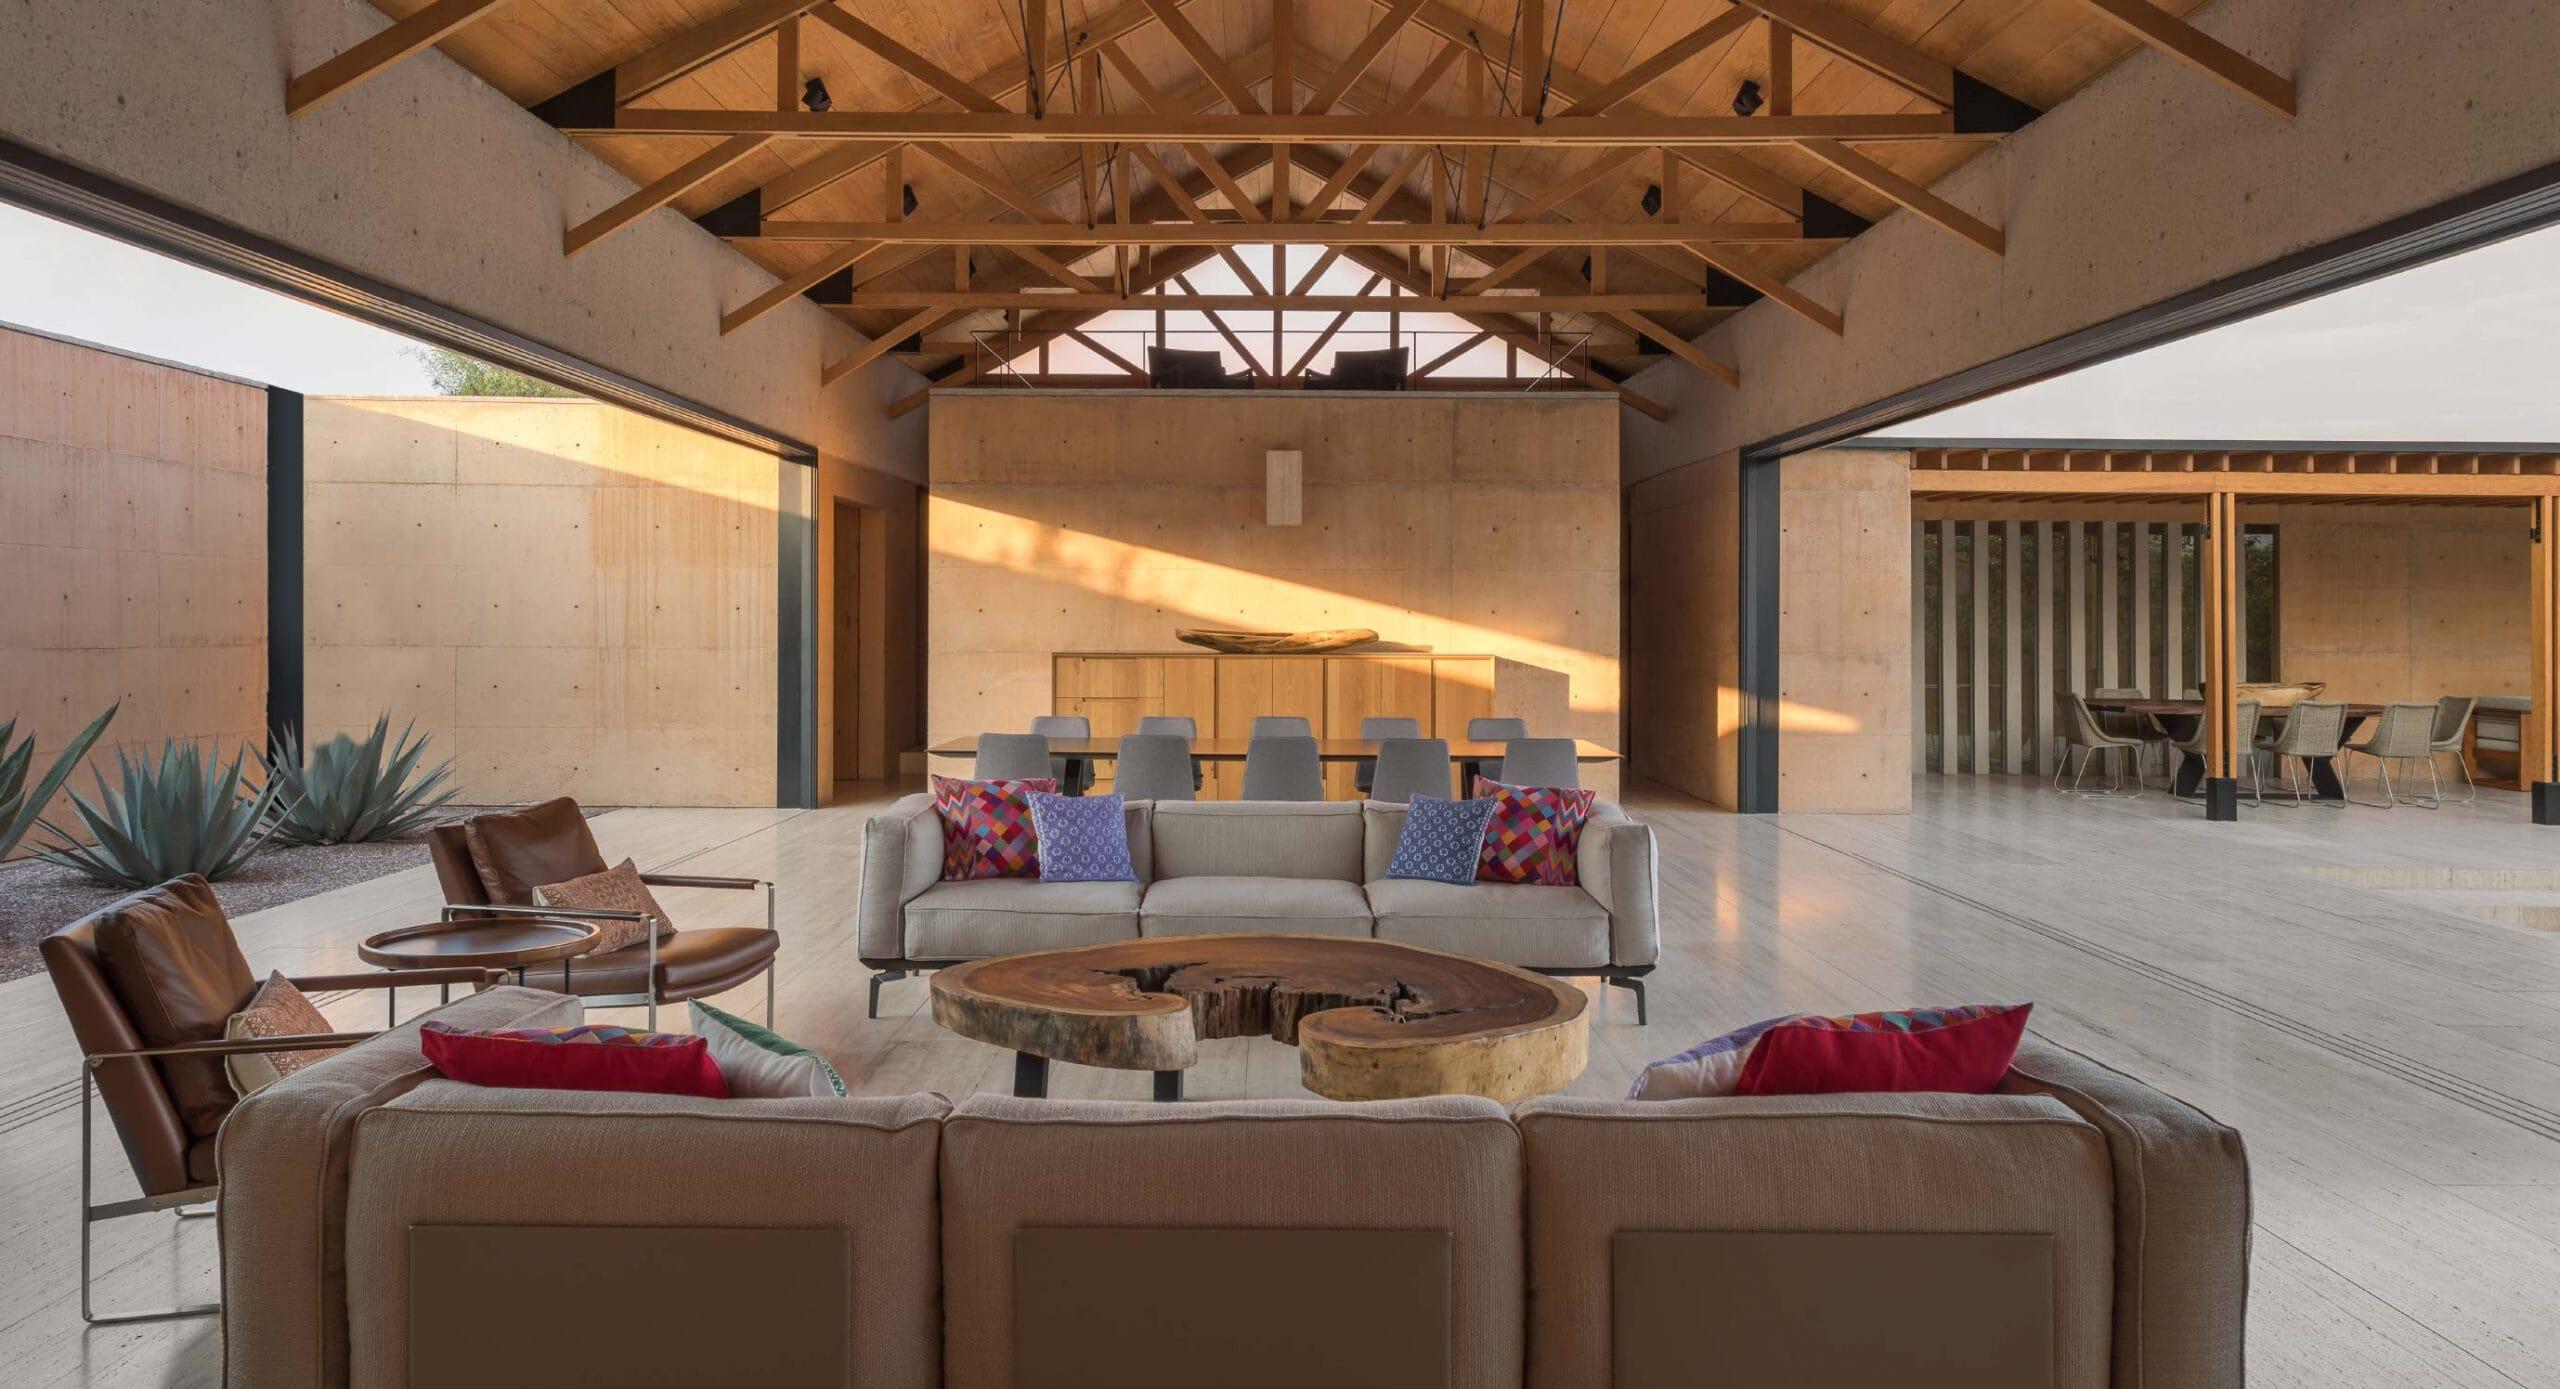 Casa Moulat: Transforming interior spaces